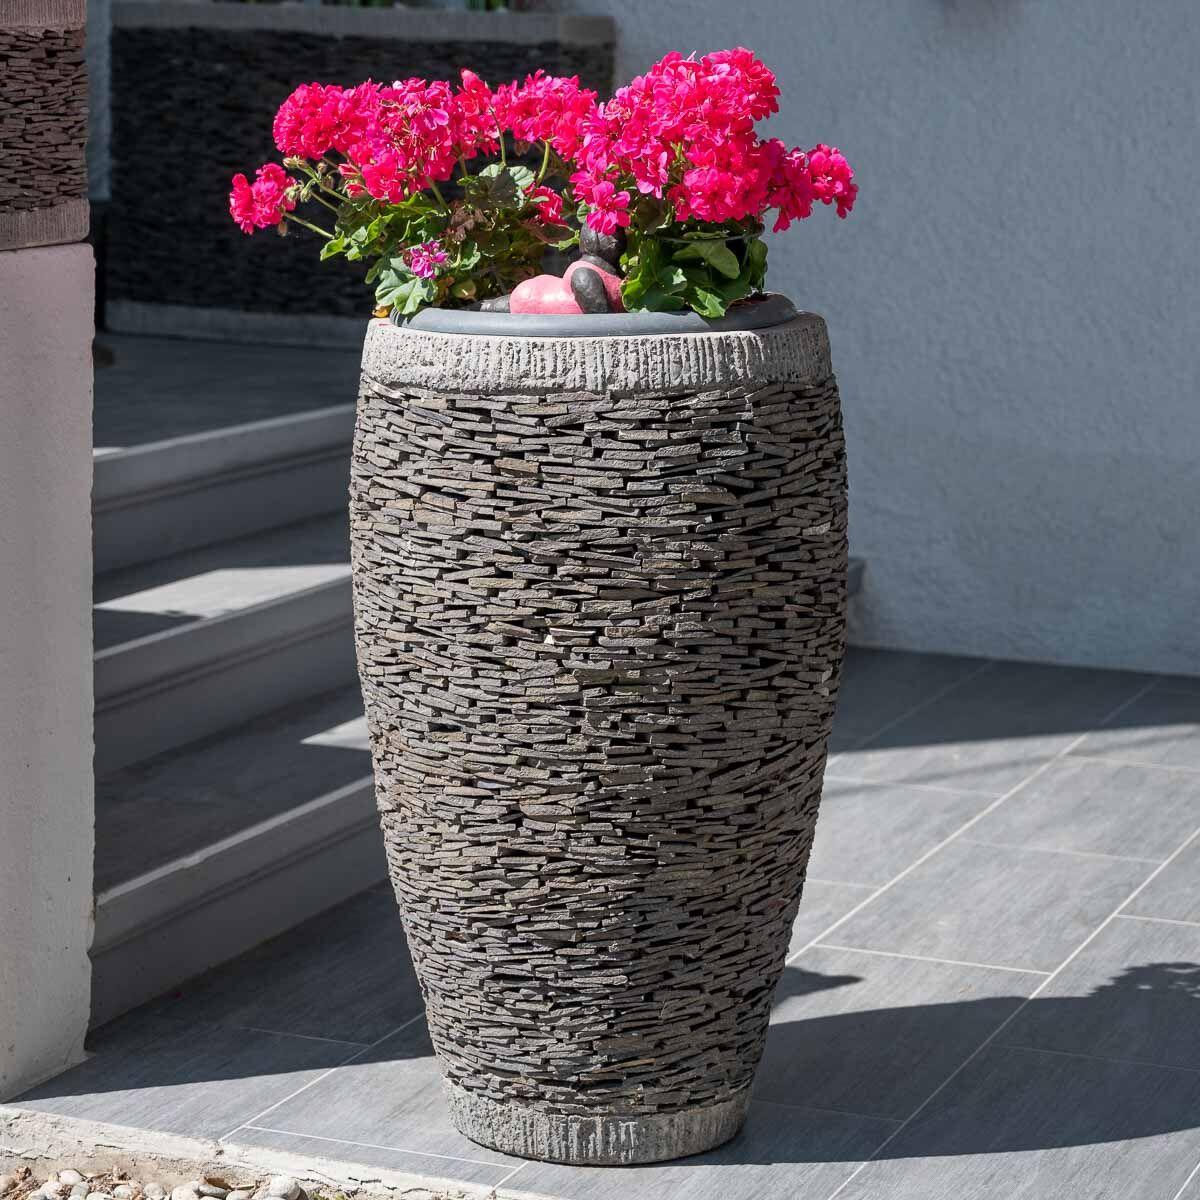 Wanda Collection Pot bac jardinière forme oeuf ardoise 80cm jardin pierre naturelle